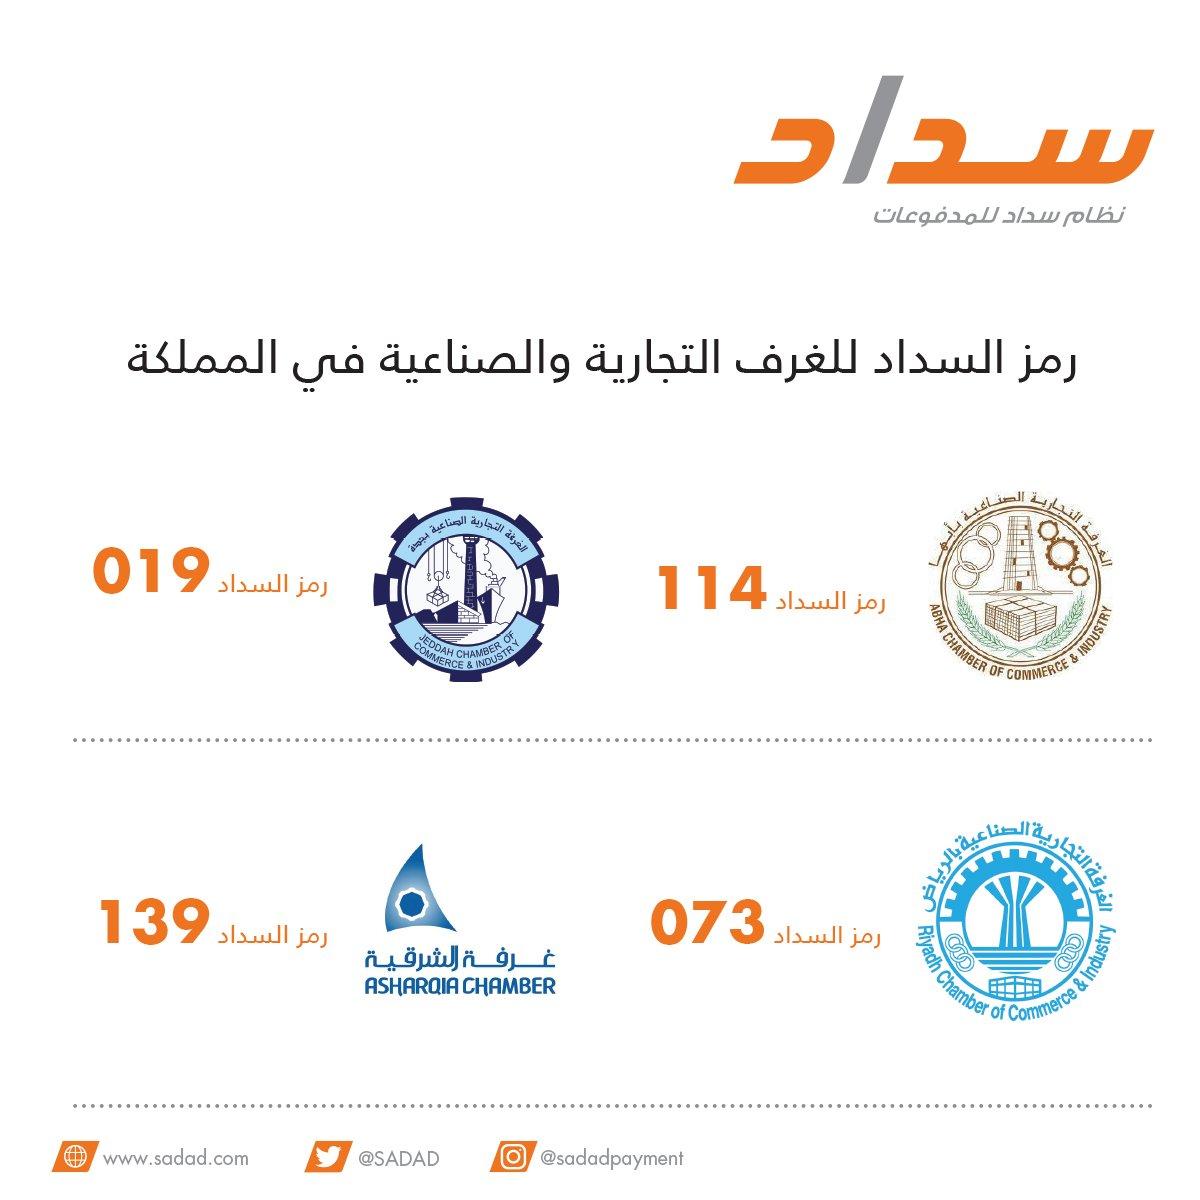 Sadad سـداد En Twitter رمز السداد للغرف التجارية والصناعية في المملكة فواتير سداد